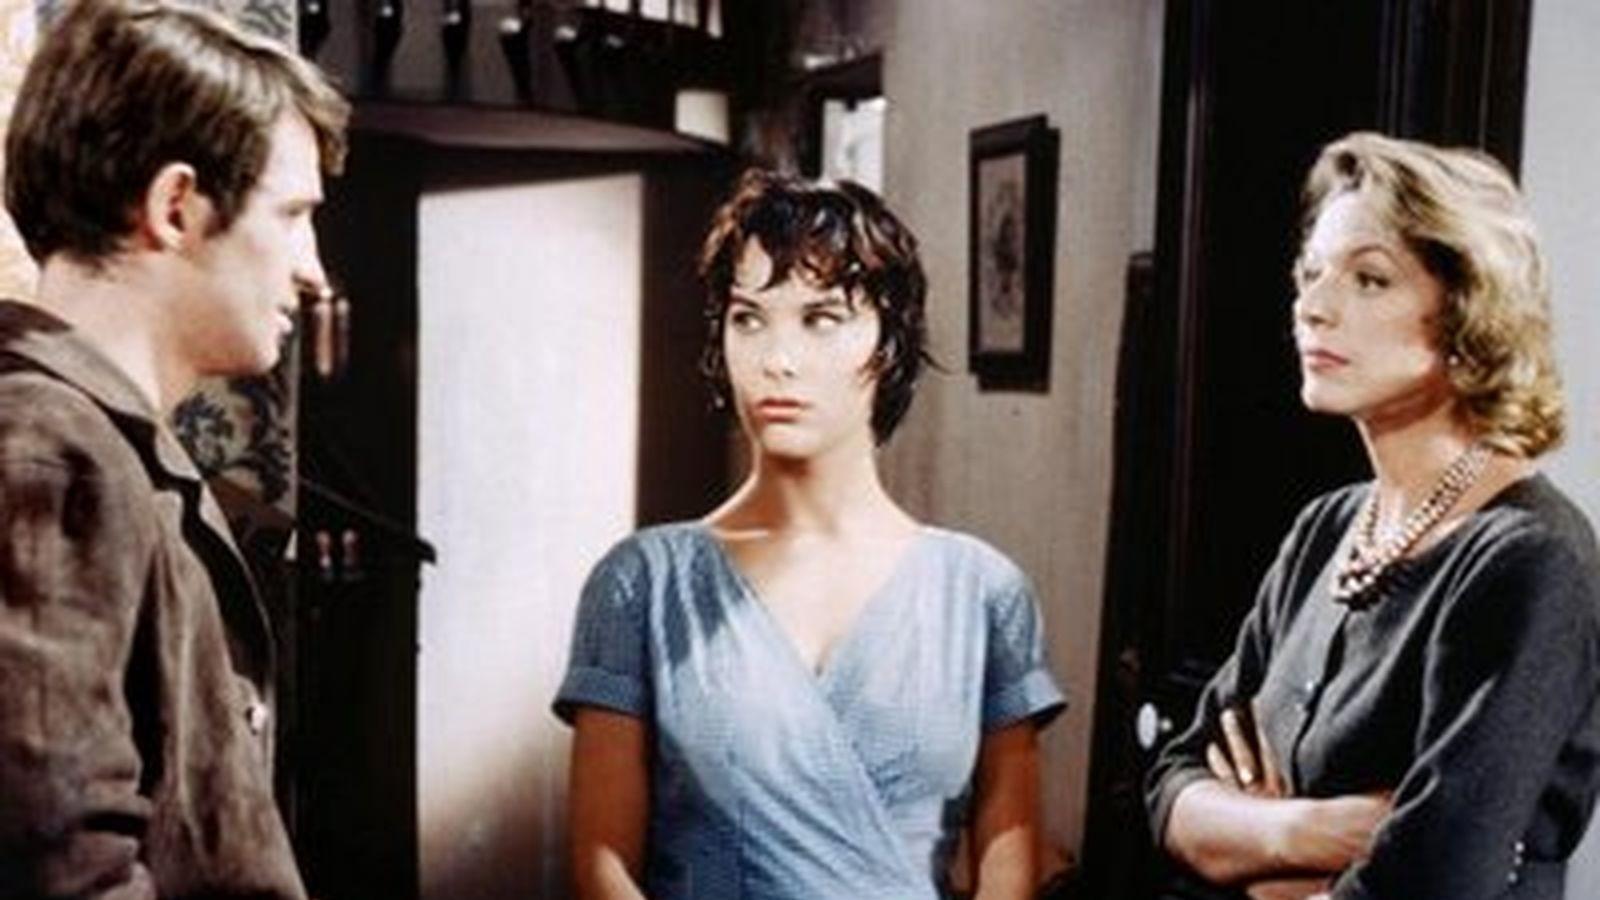 Jean-Paul Belmondo, Bernadette Lafont, and Madeleine Robinson in À double tour (1959)